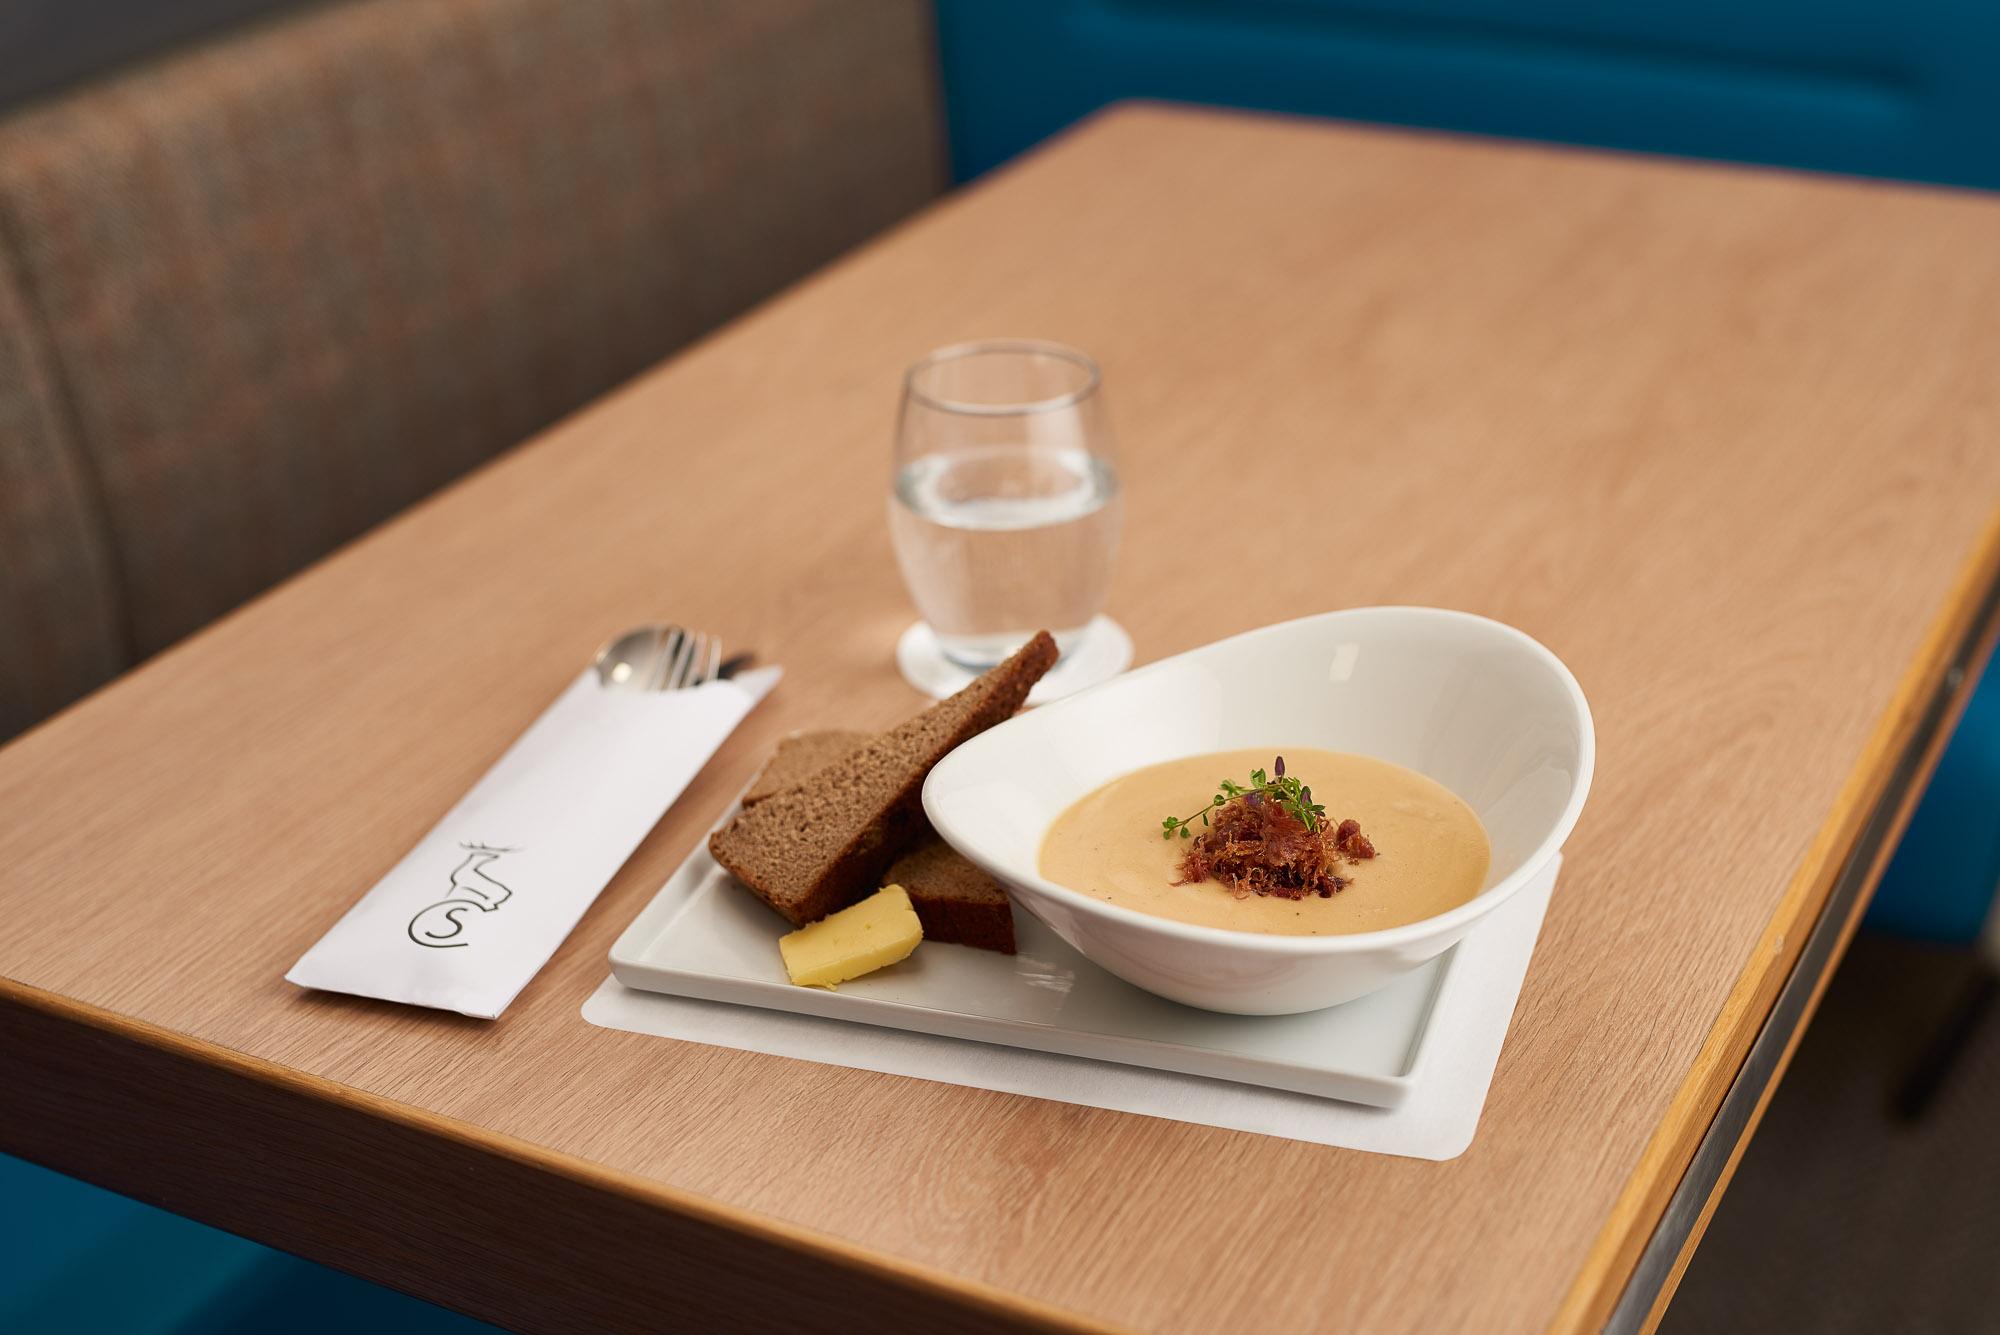 Caledonian Sleeper | Food and drink on-board